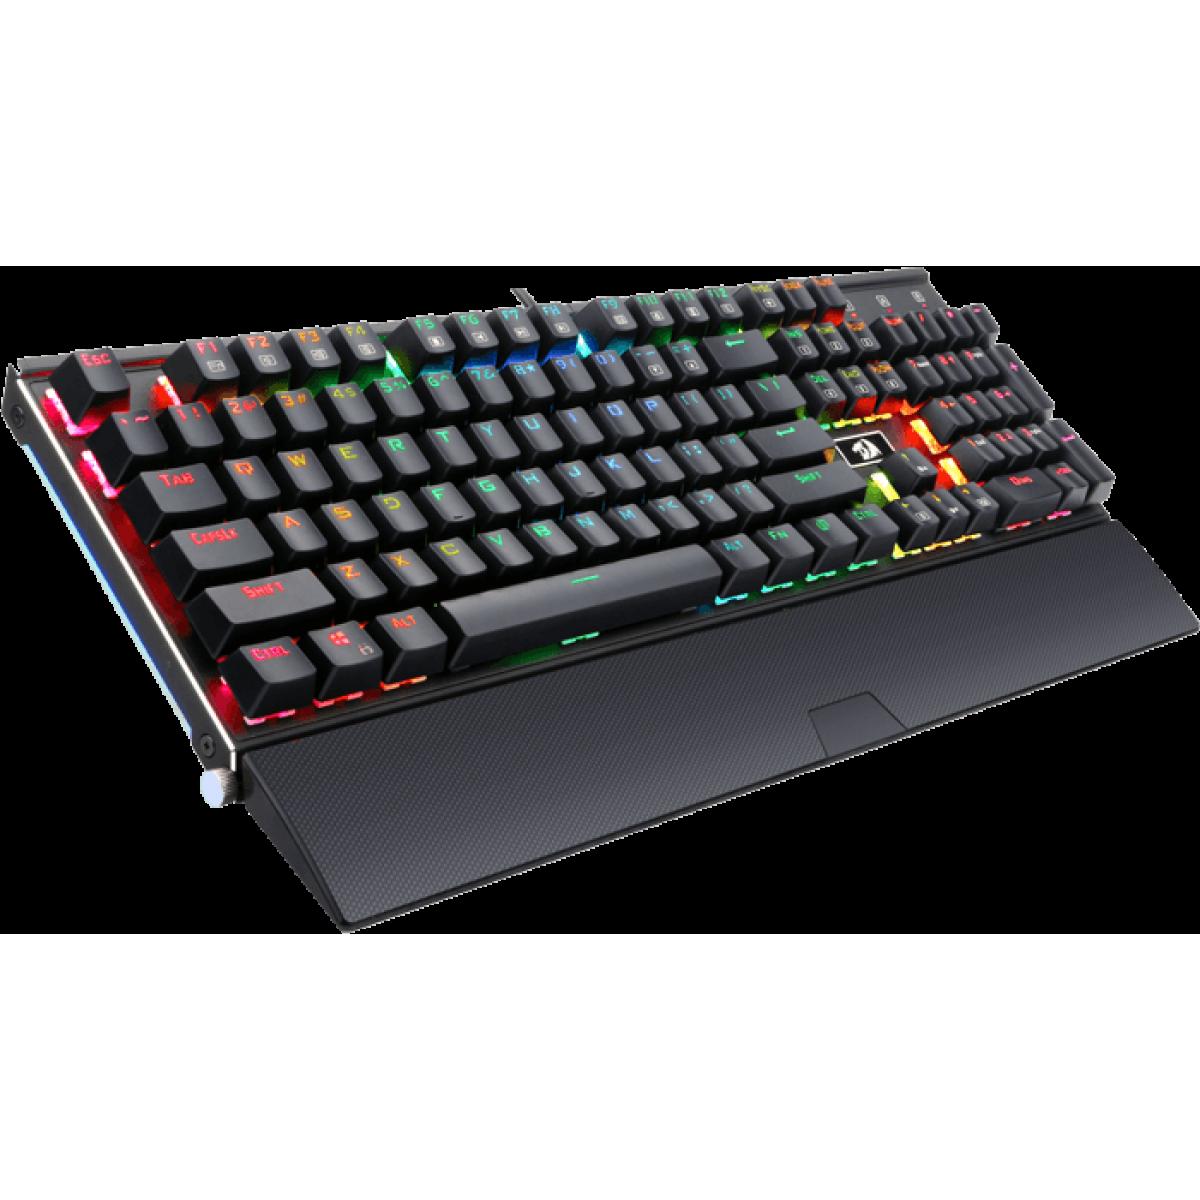 Teclado Mecânico Gamer Redragon Rahu K567 RGB, Switch Azul, Black